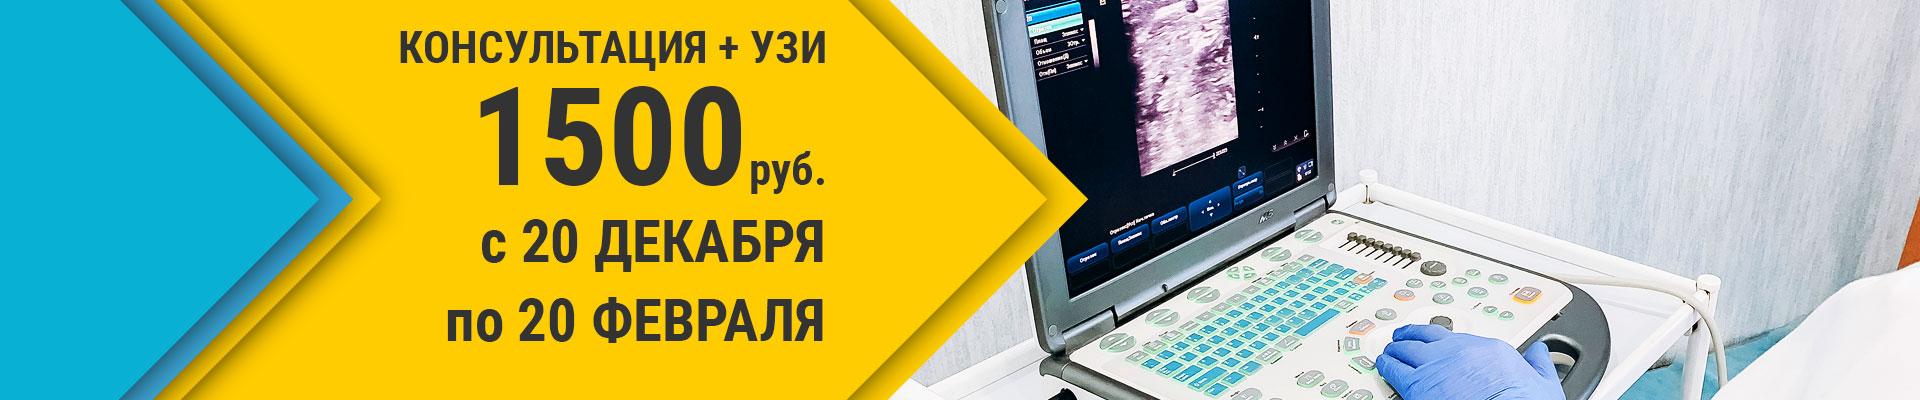 Варикозное расширение вен клиники краснодара thumbnail